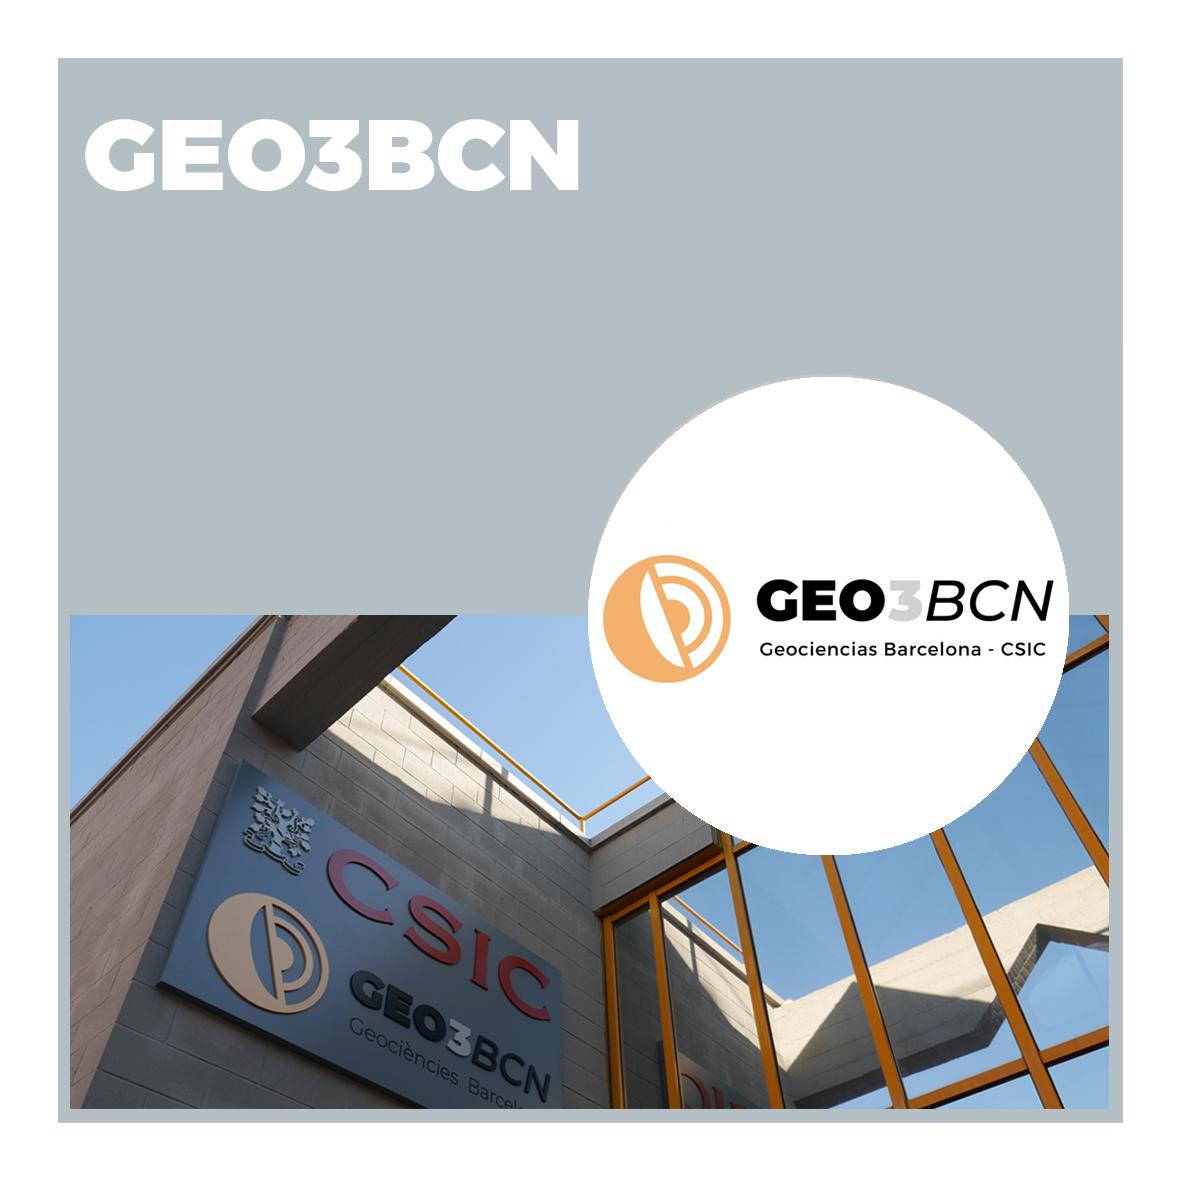 Geociencias Barcelona (GEO3BCN)